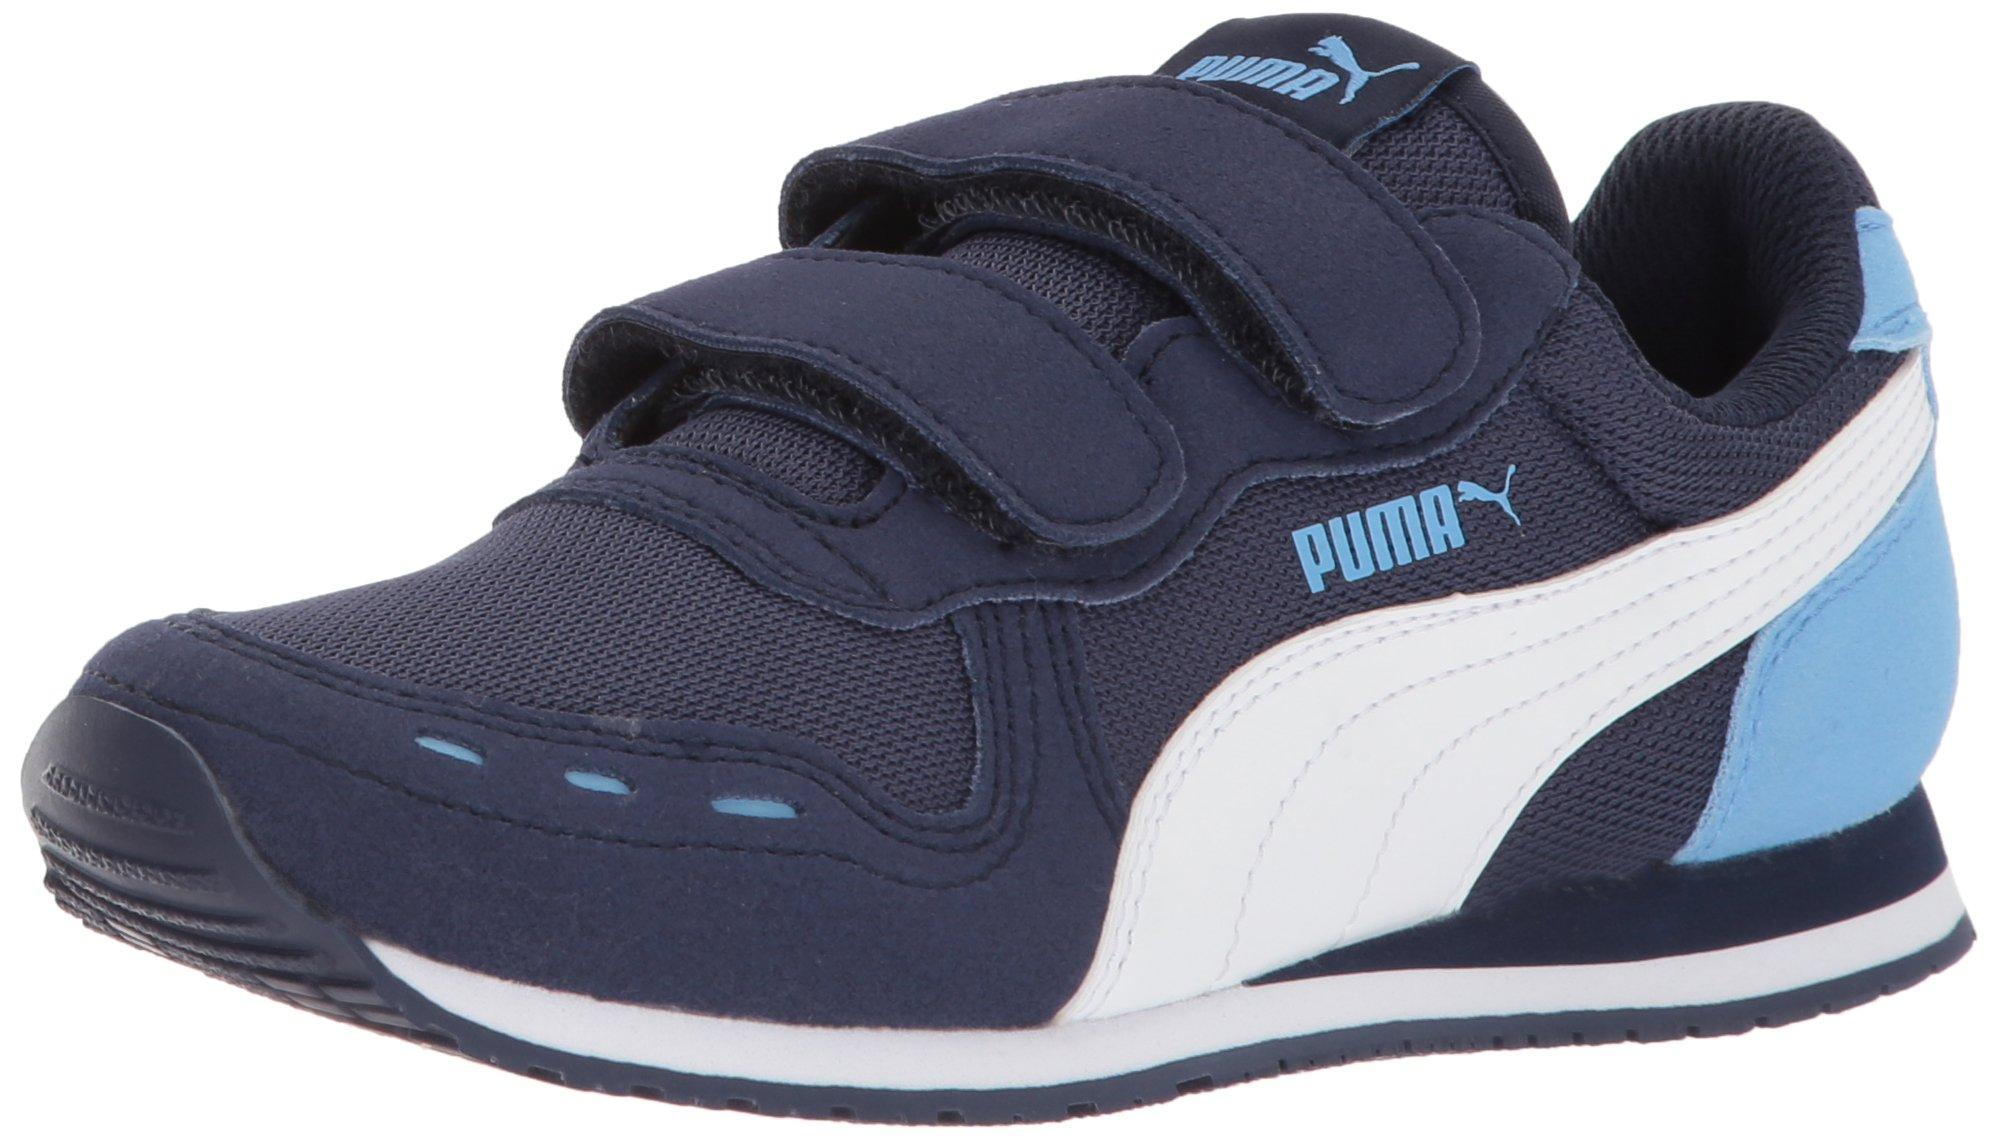 84245e2dcef PUMA Kids  Cabana Racer Mesh Velcro Sneaker